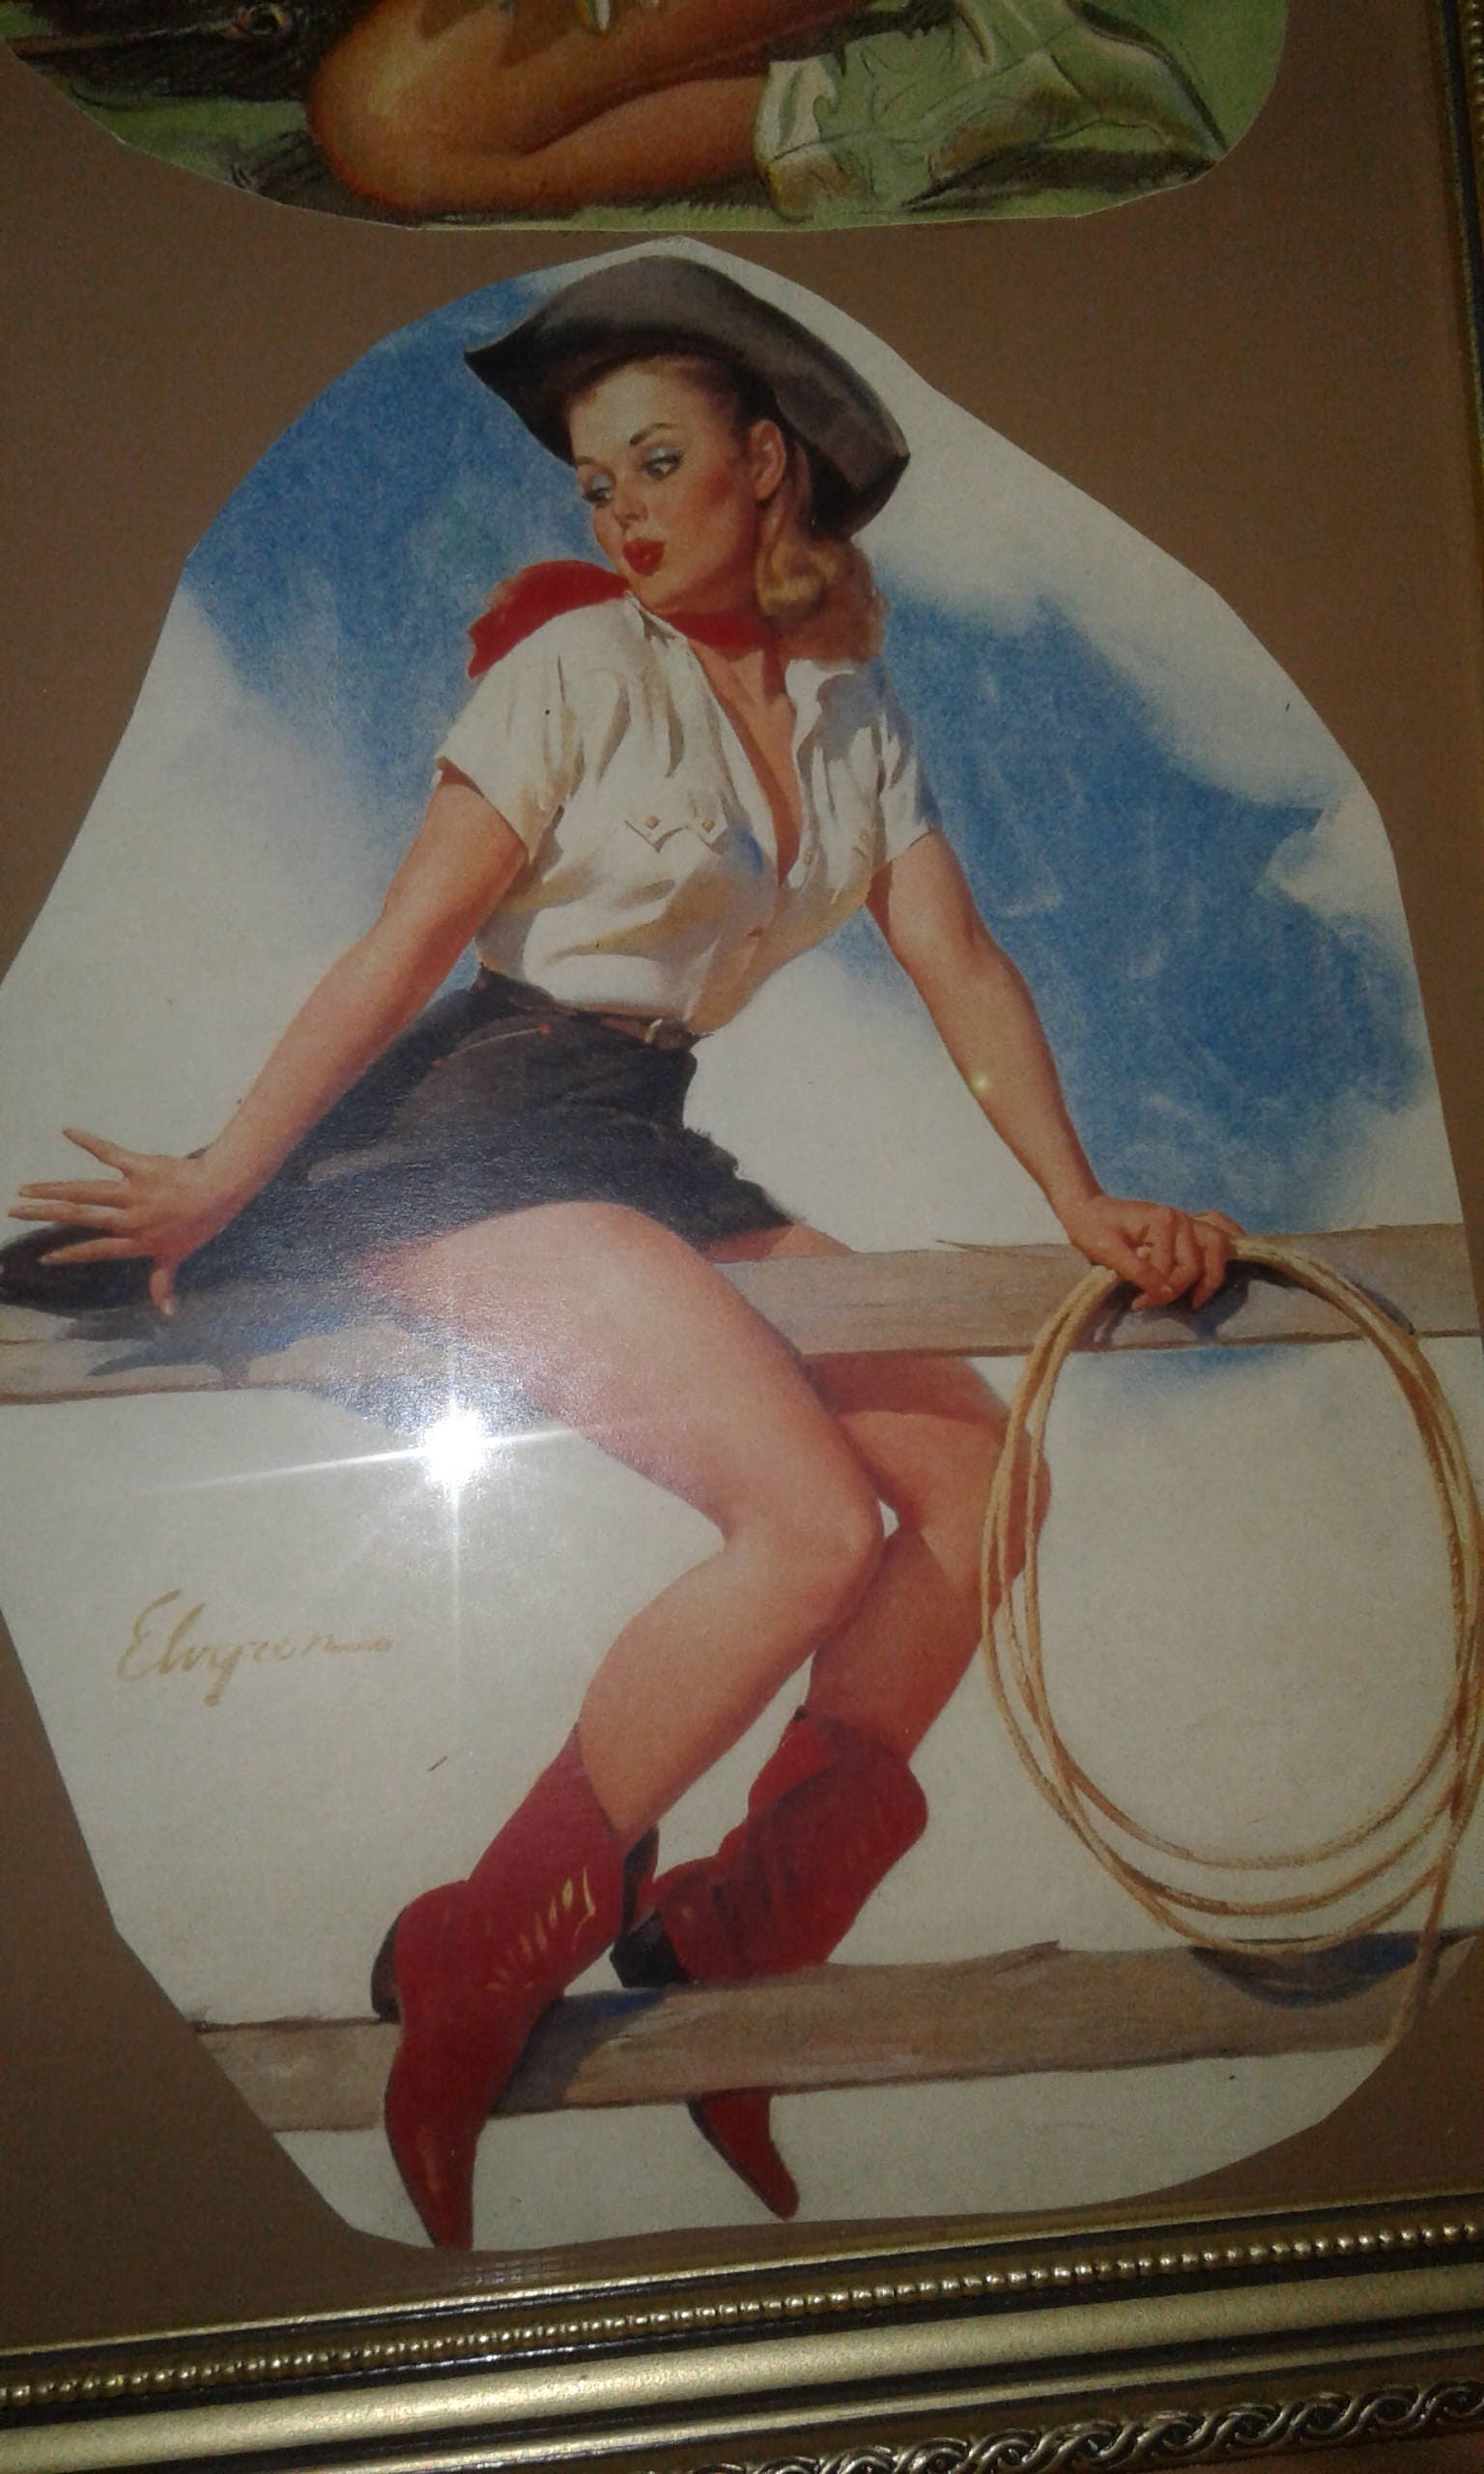 Vintage Western Cowgirl Pin-Ups Print Print Print   Signed   Western Hats Bandanna  botas  Gloves  Gun Lariat  Calf Roping  Saddle Bronc Sitting on Fence  89814d